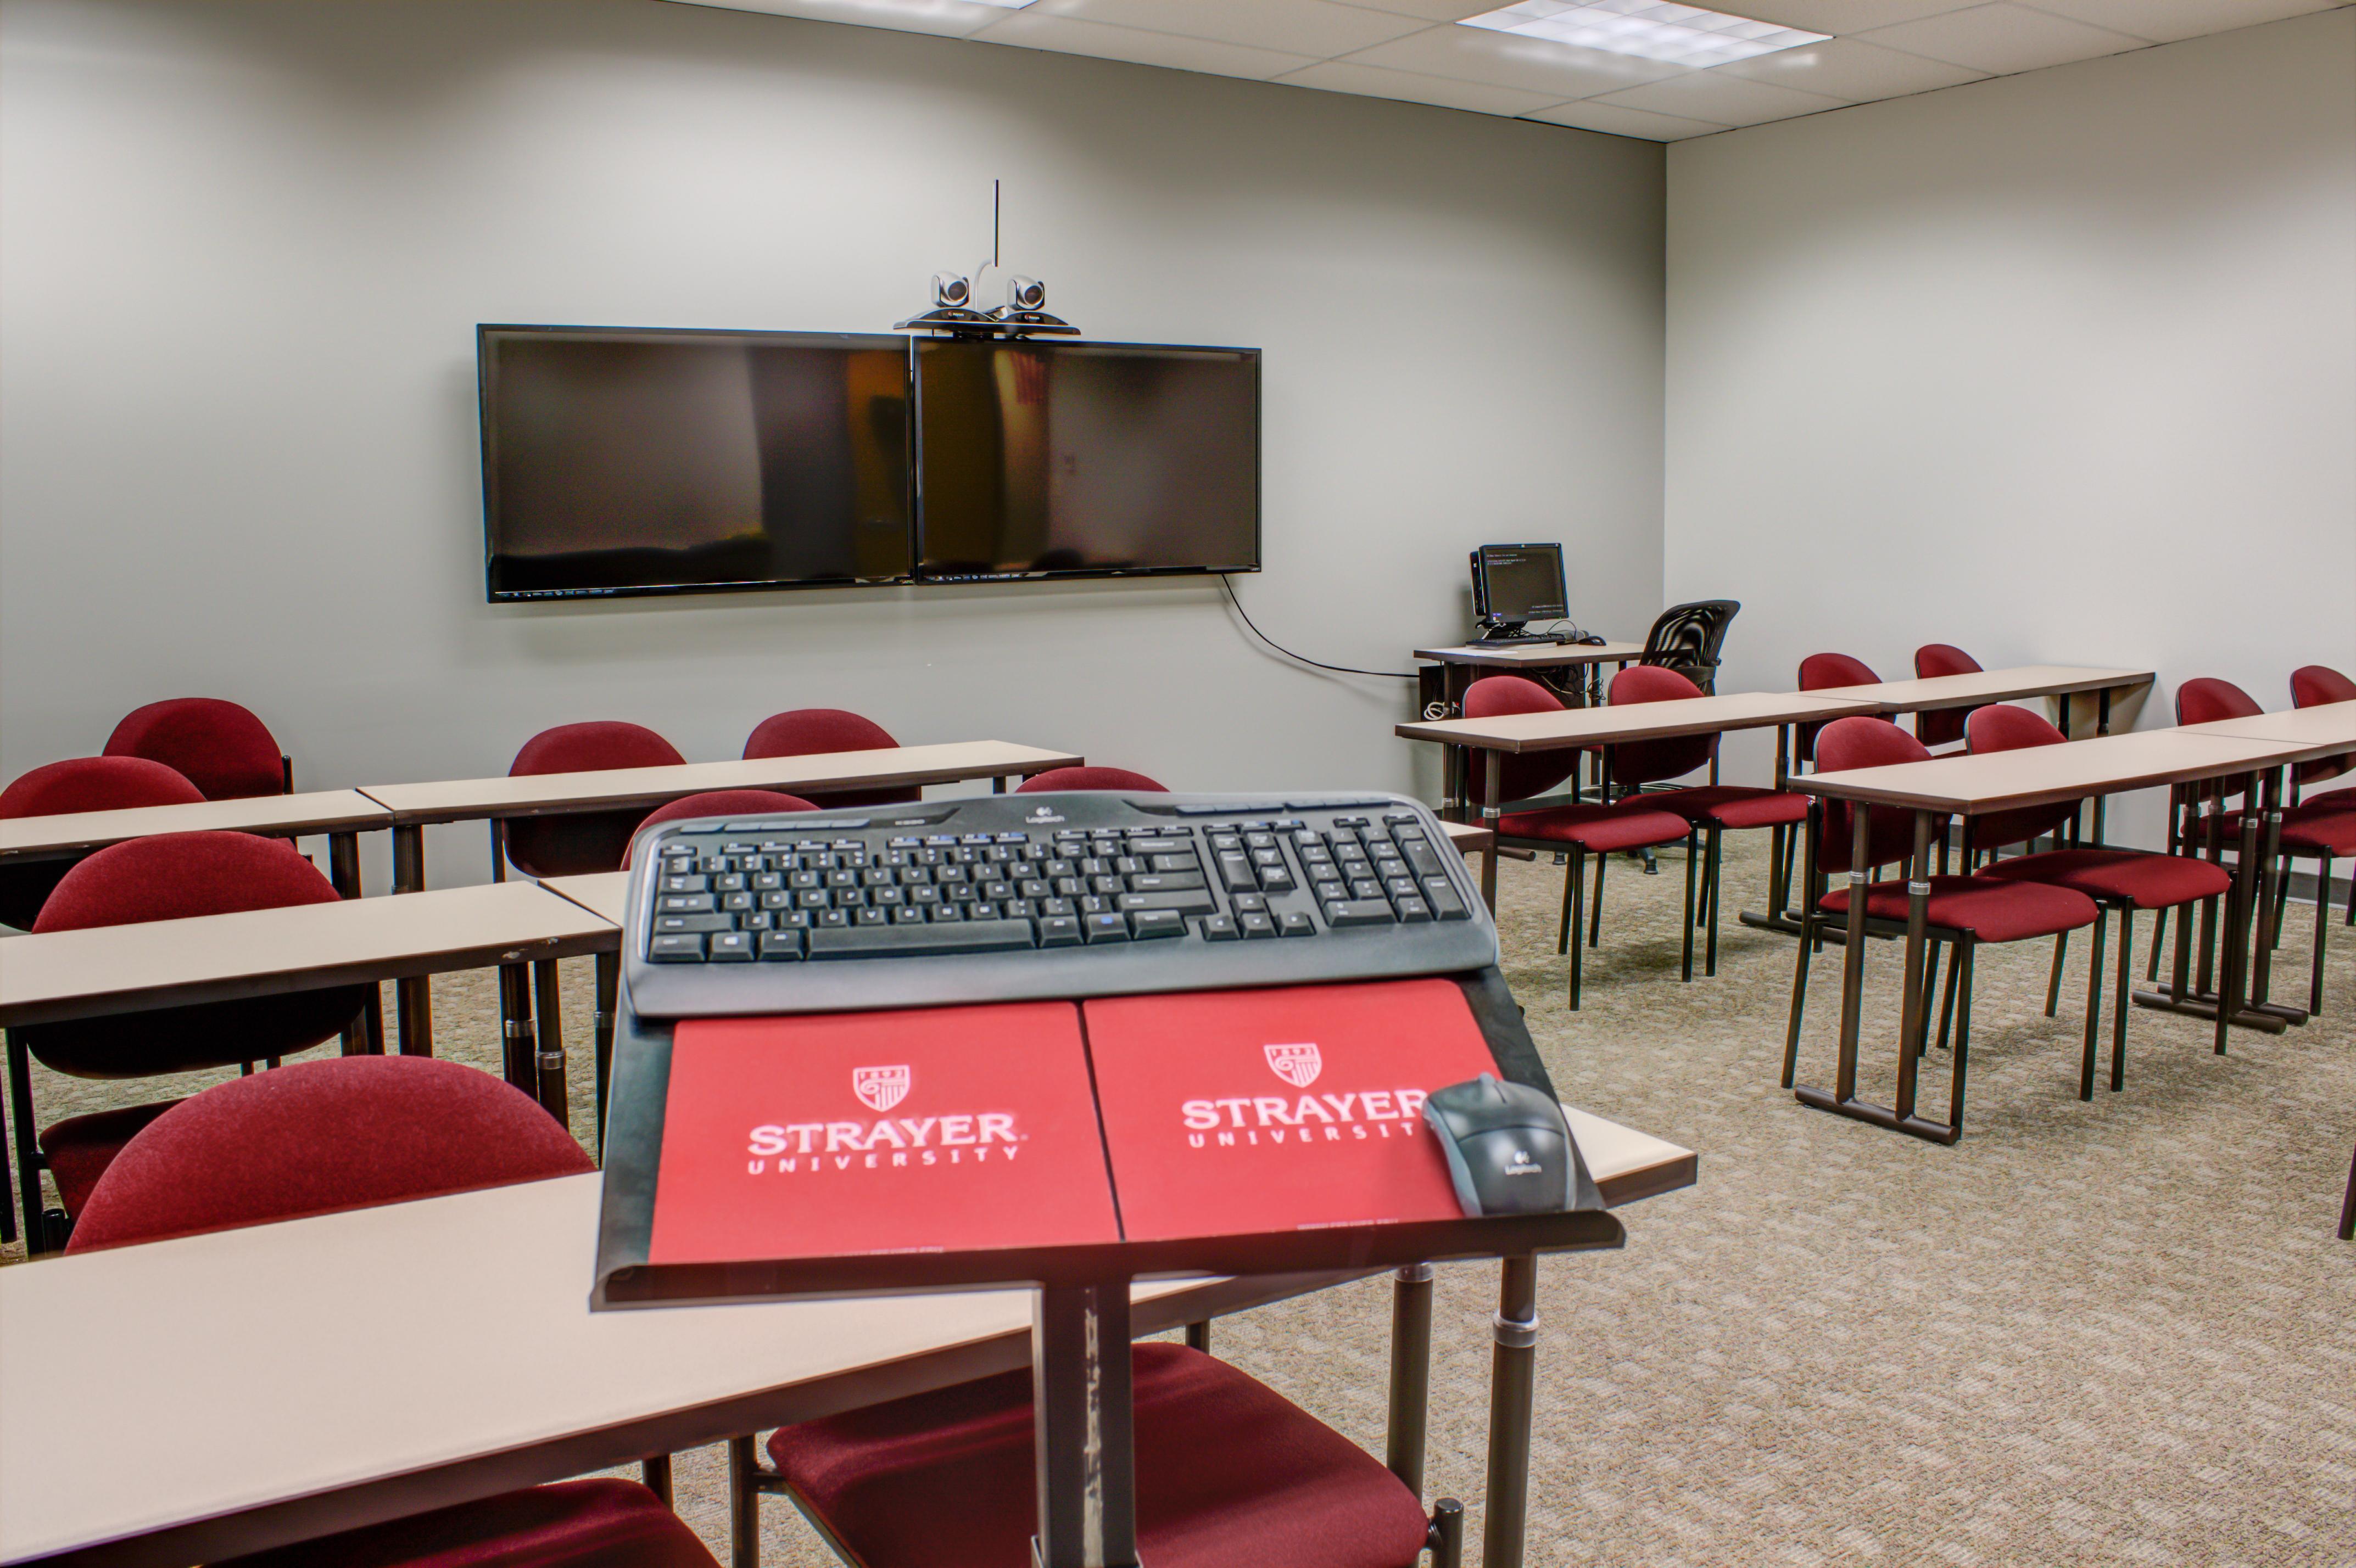 Strayer University image 16